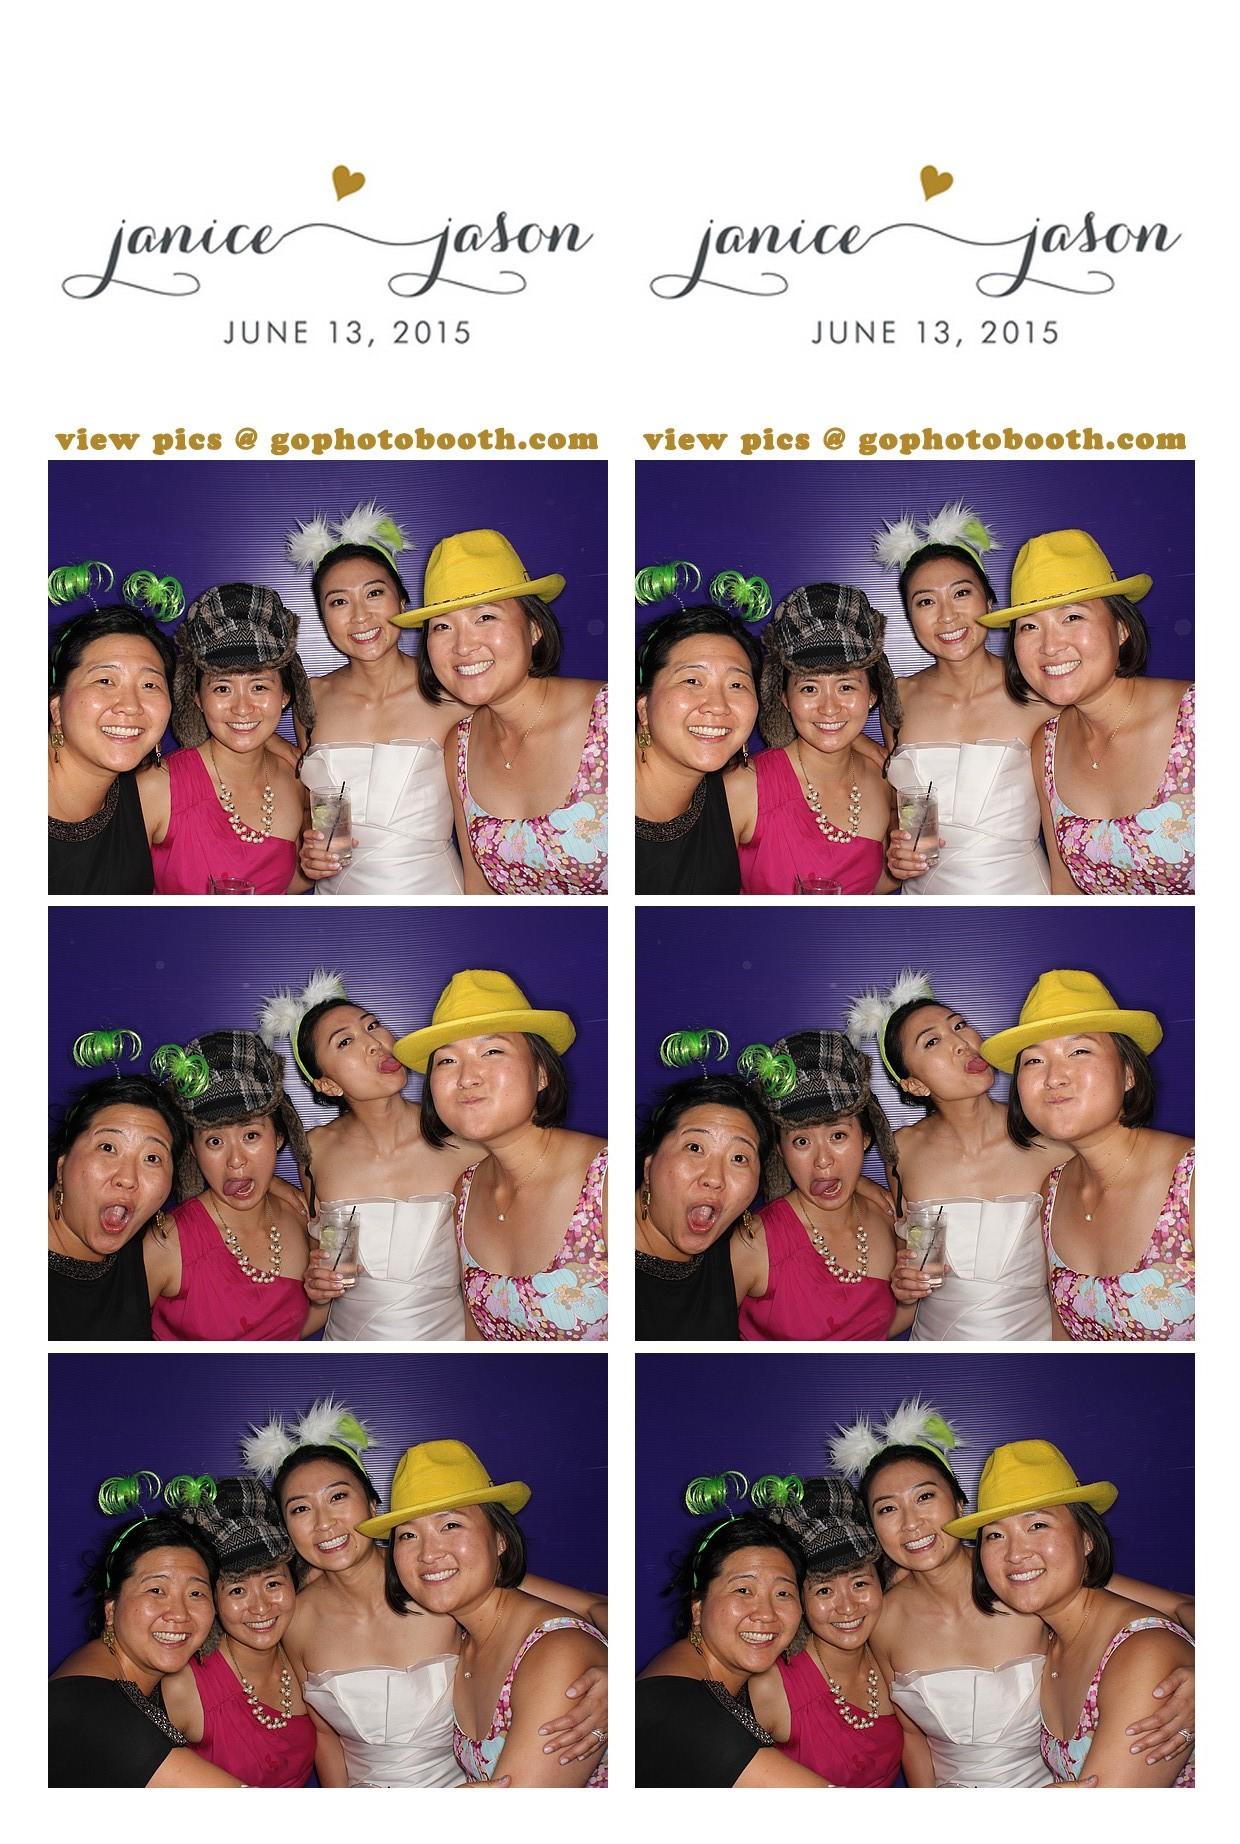 Janice & Jason's Wedding photo booth 6/13/15